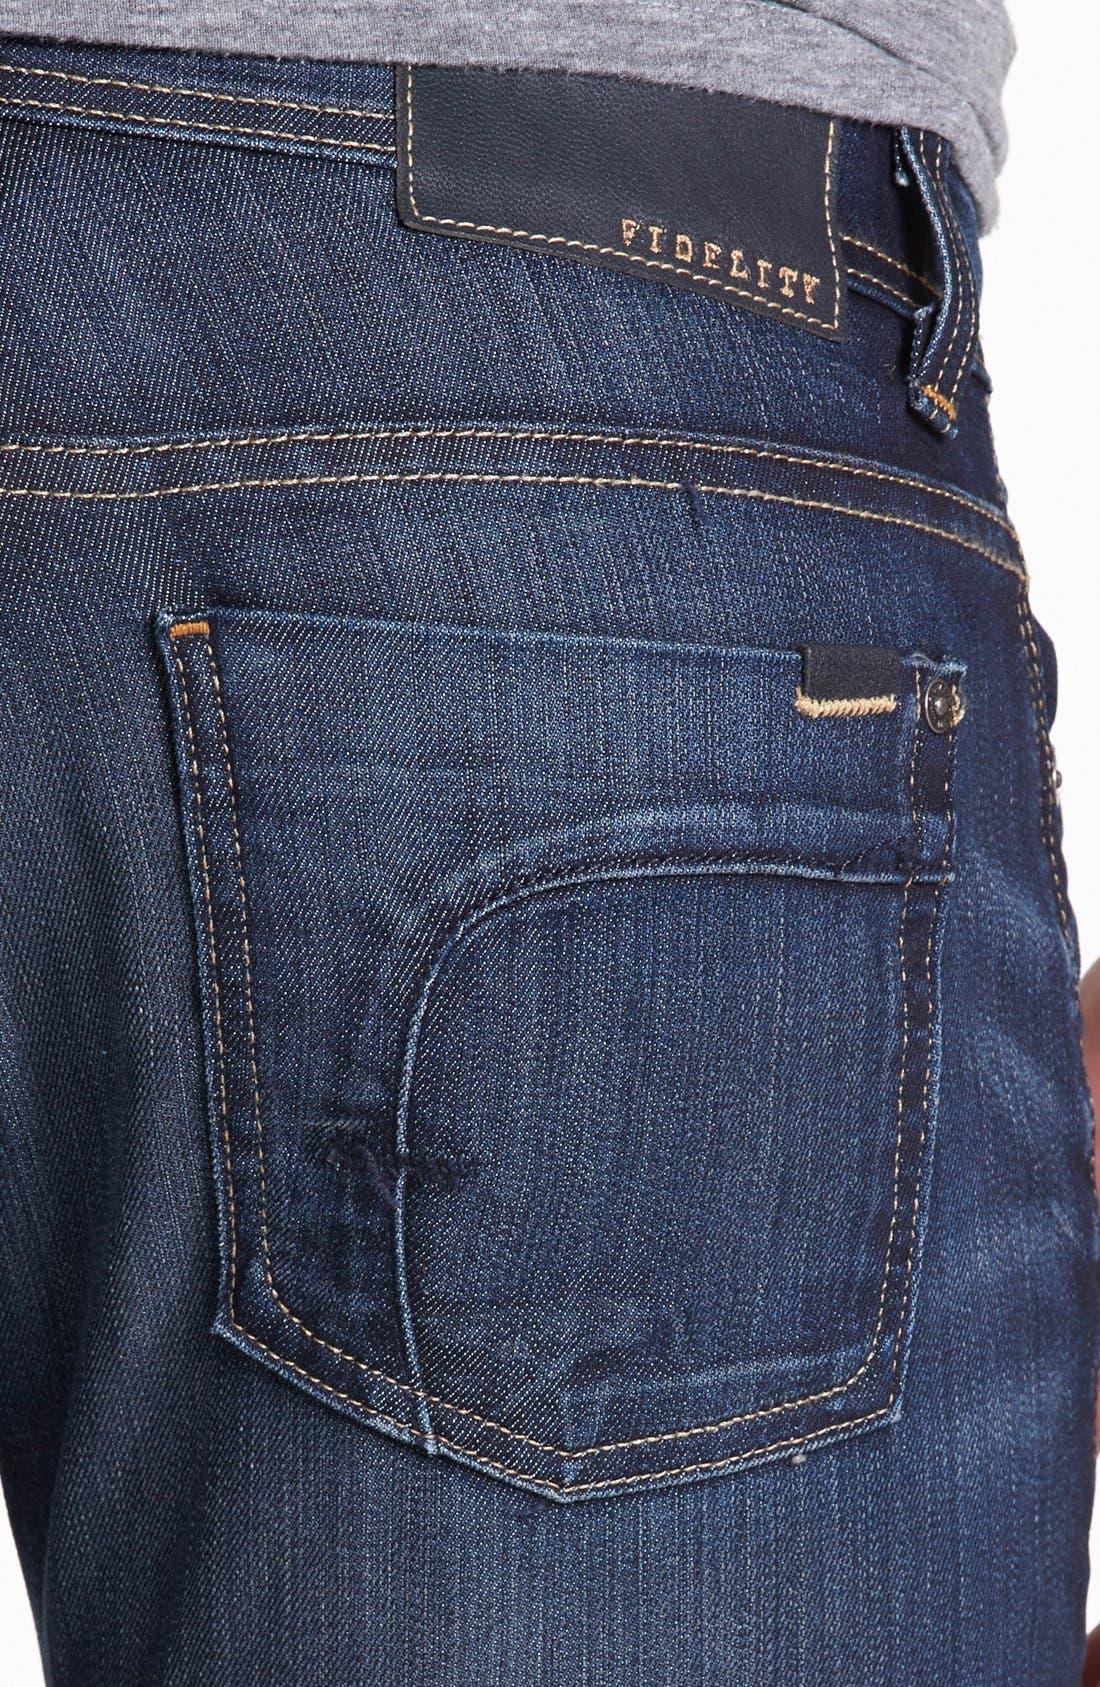 Alternate Image 4  - Fidelity Denim 'Slim Jim' Slim Fit Jeans (Trigger Dark) (Tall)